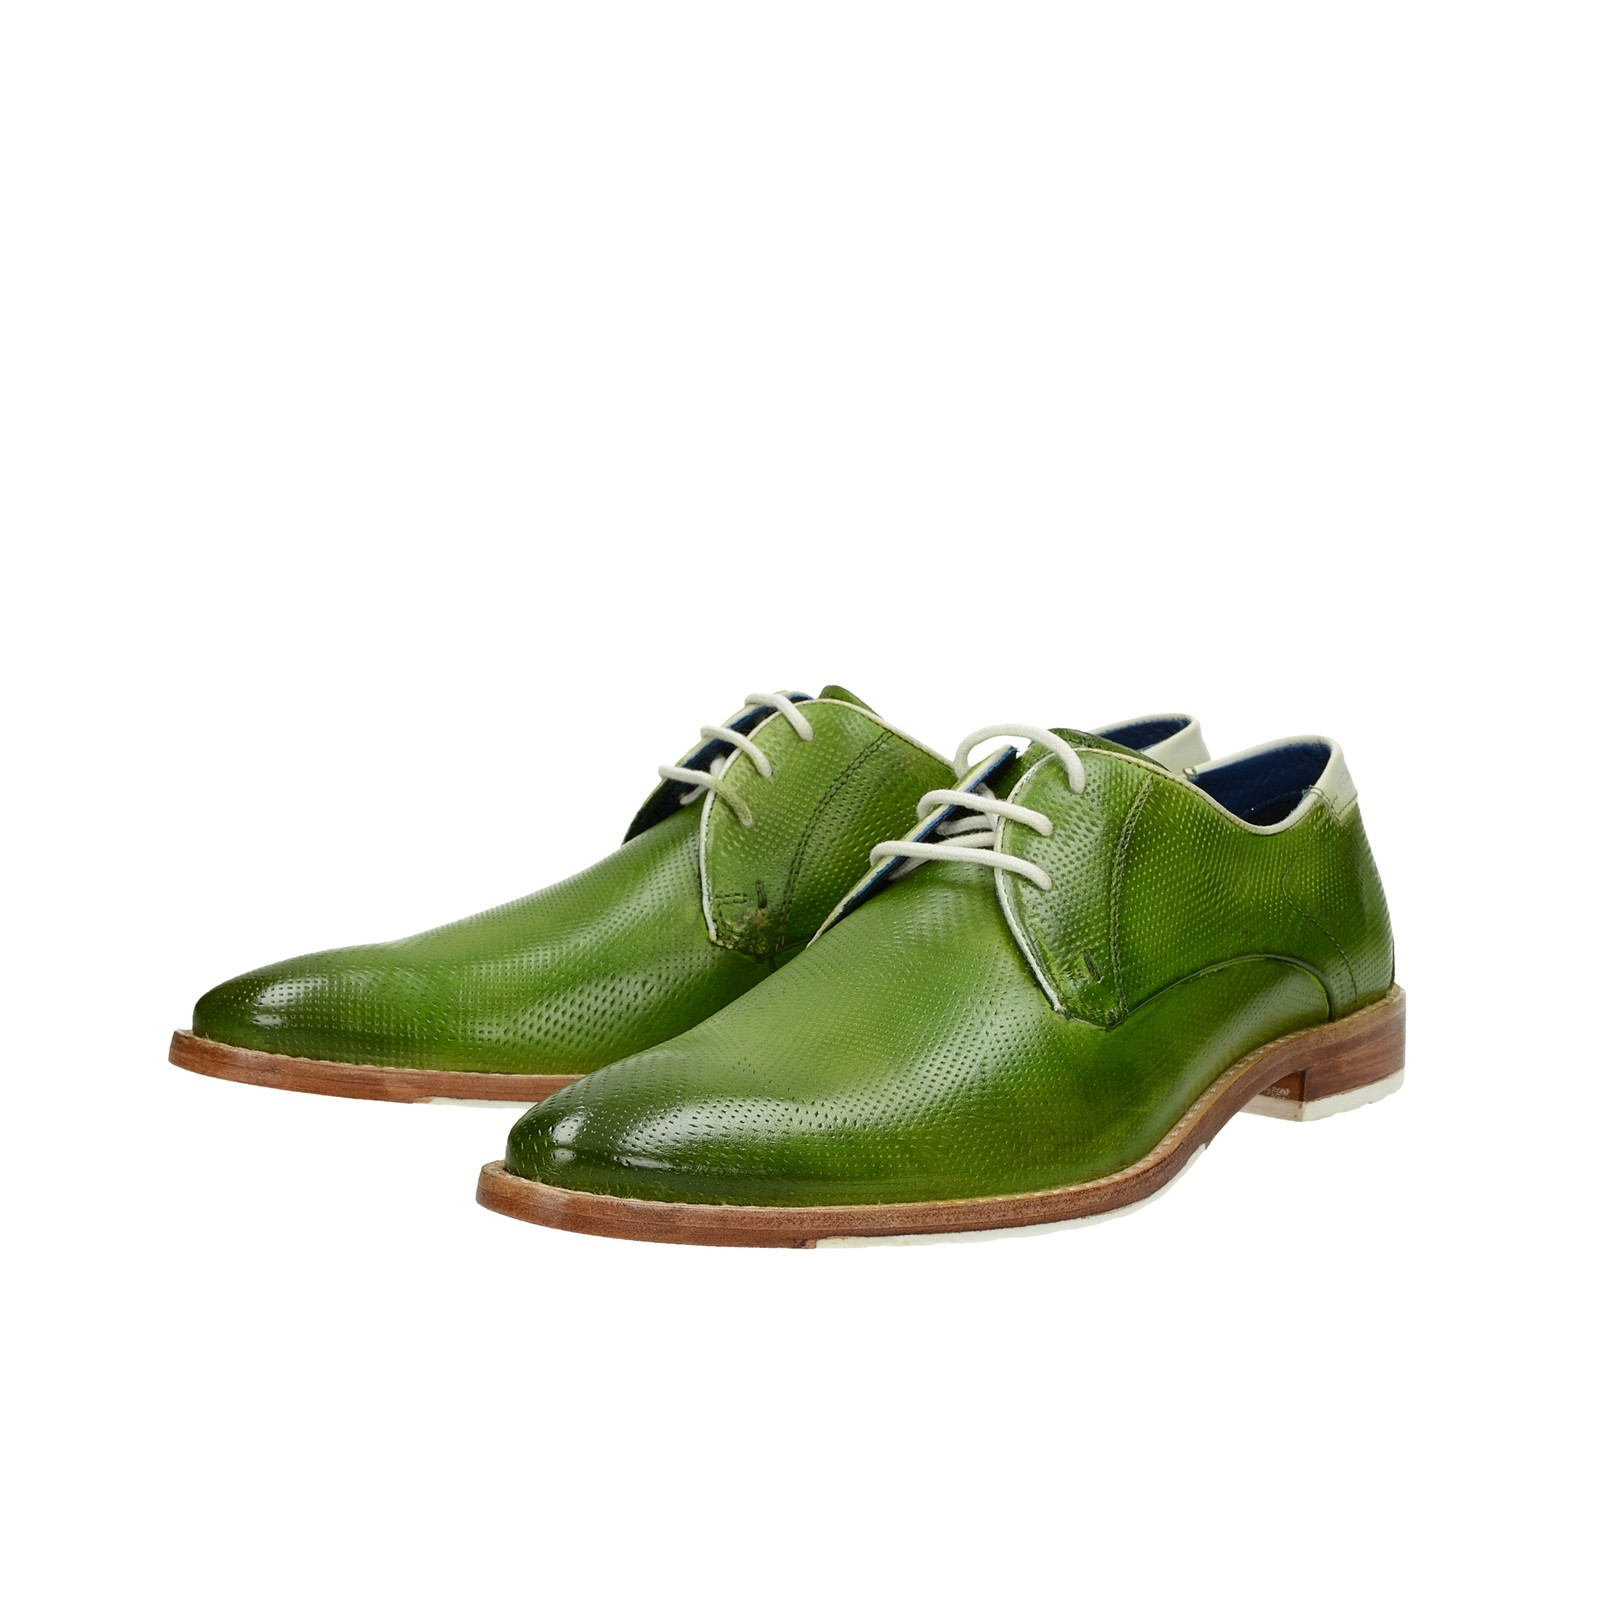 a0228498b22b Daniel Hechter pánske kožené štýlové topánky - zelené ...